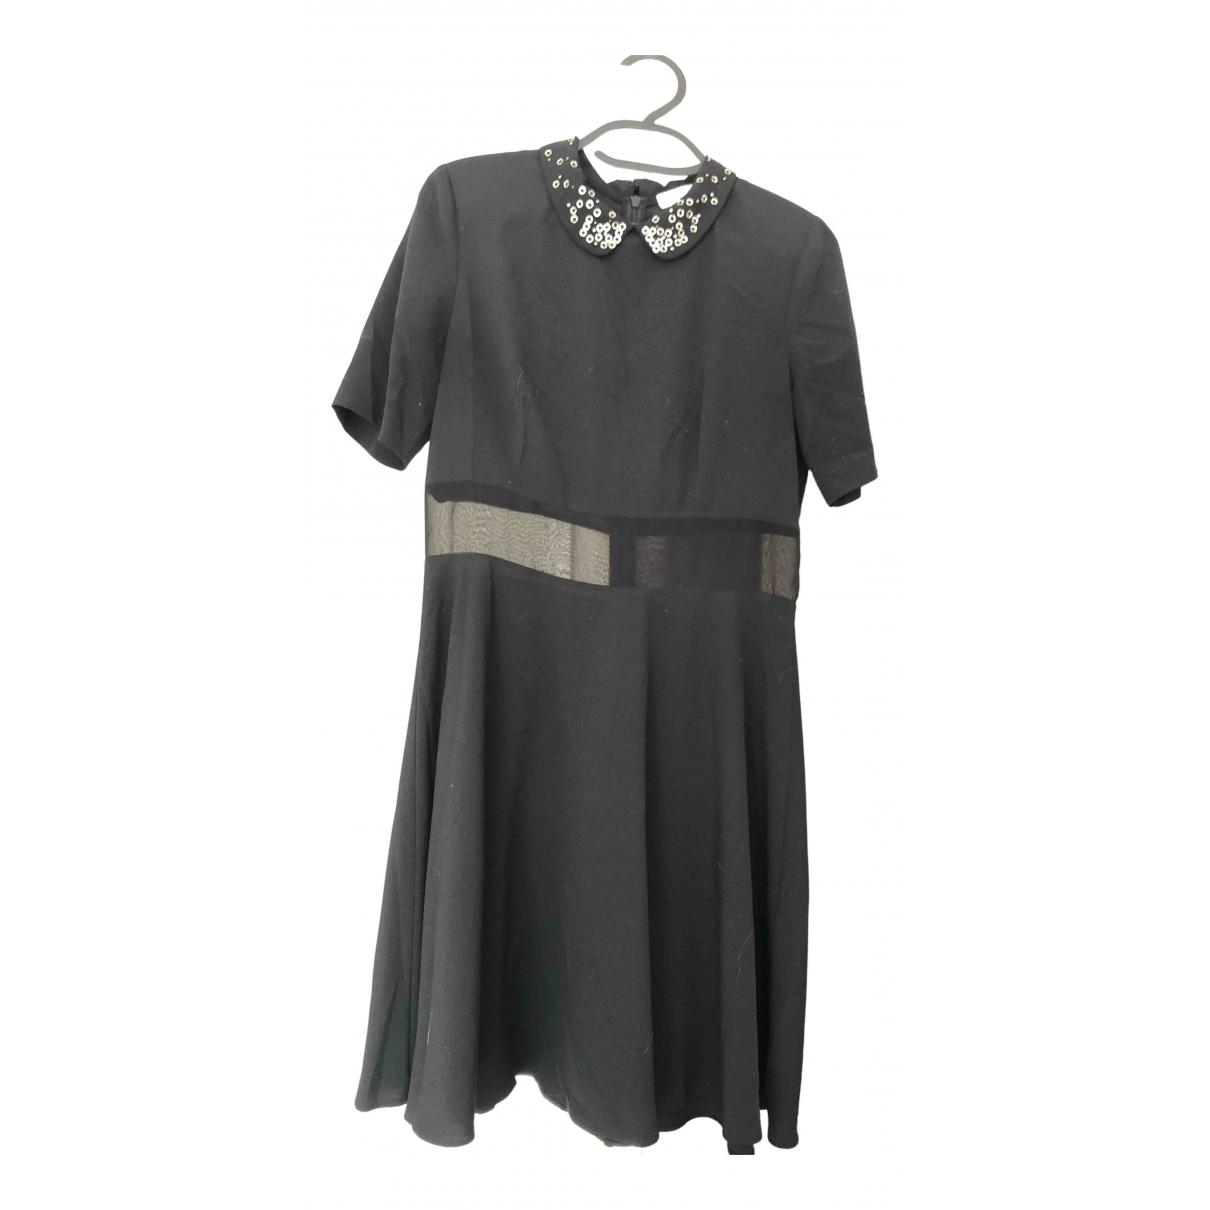 Claudie Pierlot N Black dress for Women 38 FR